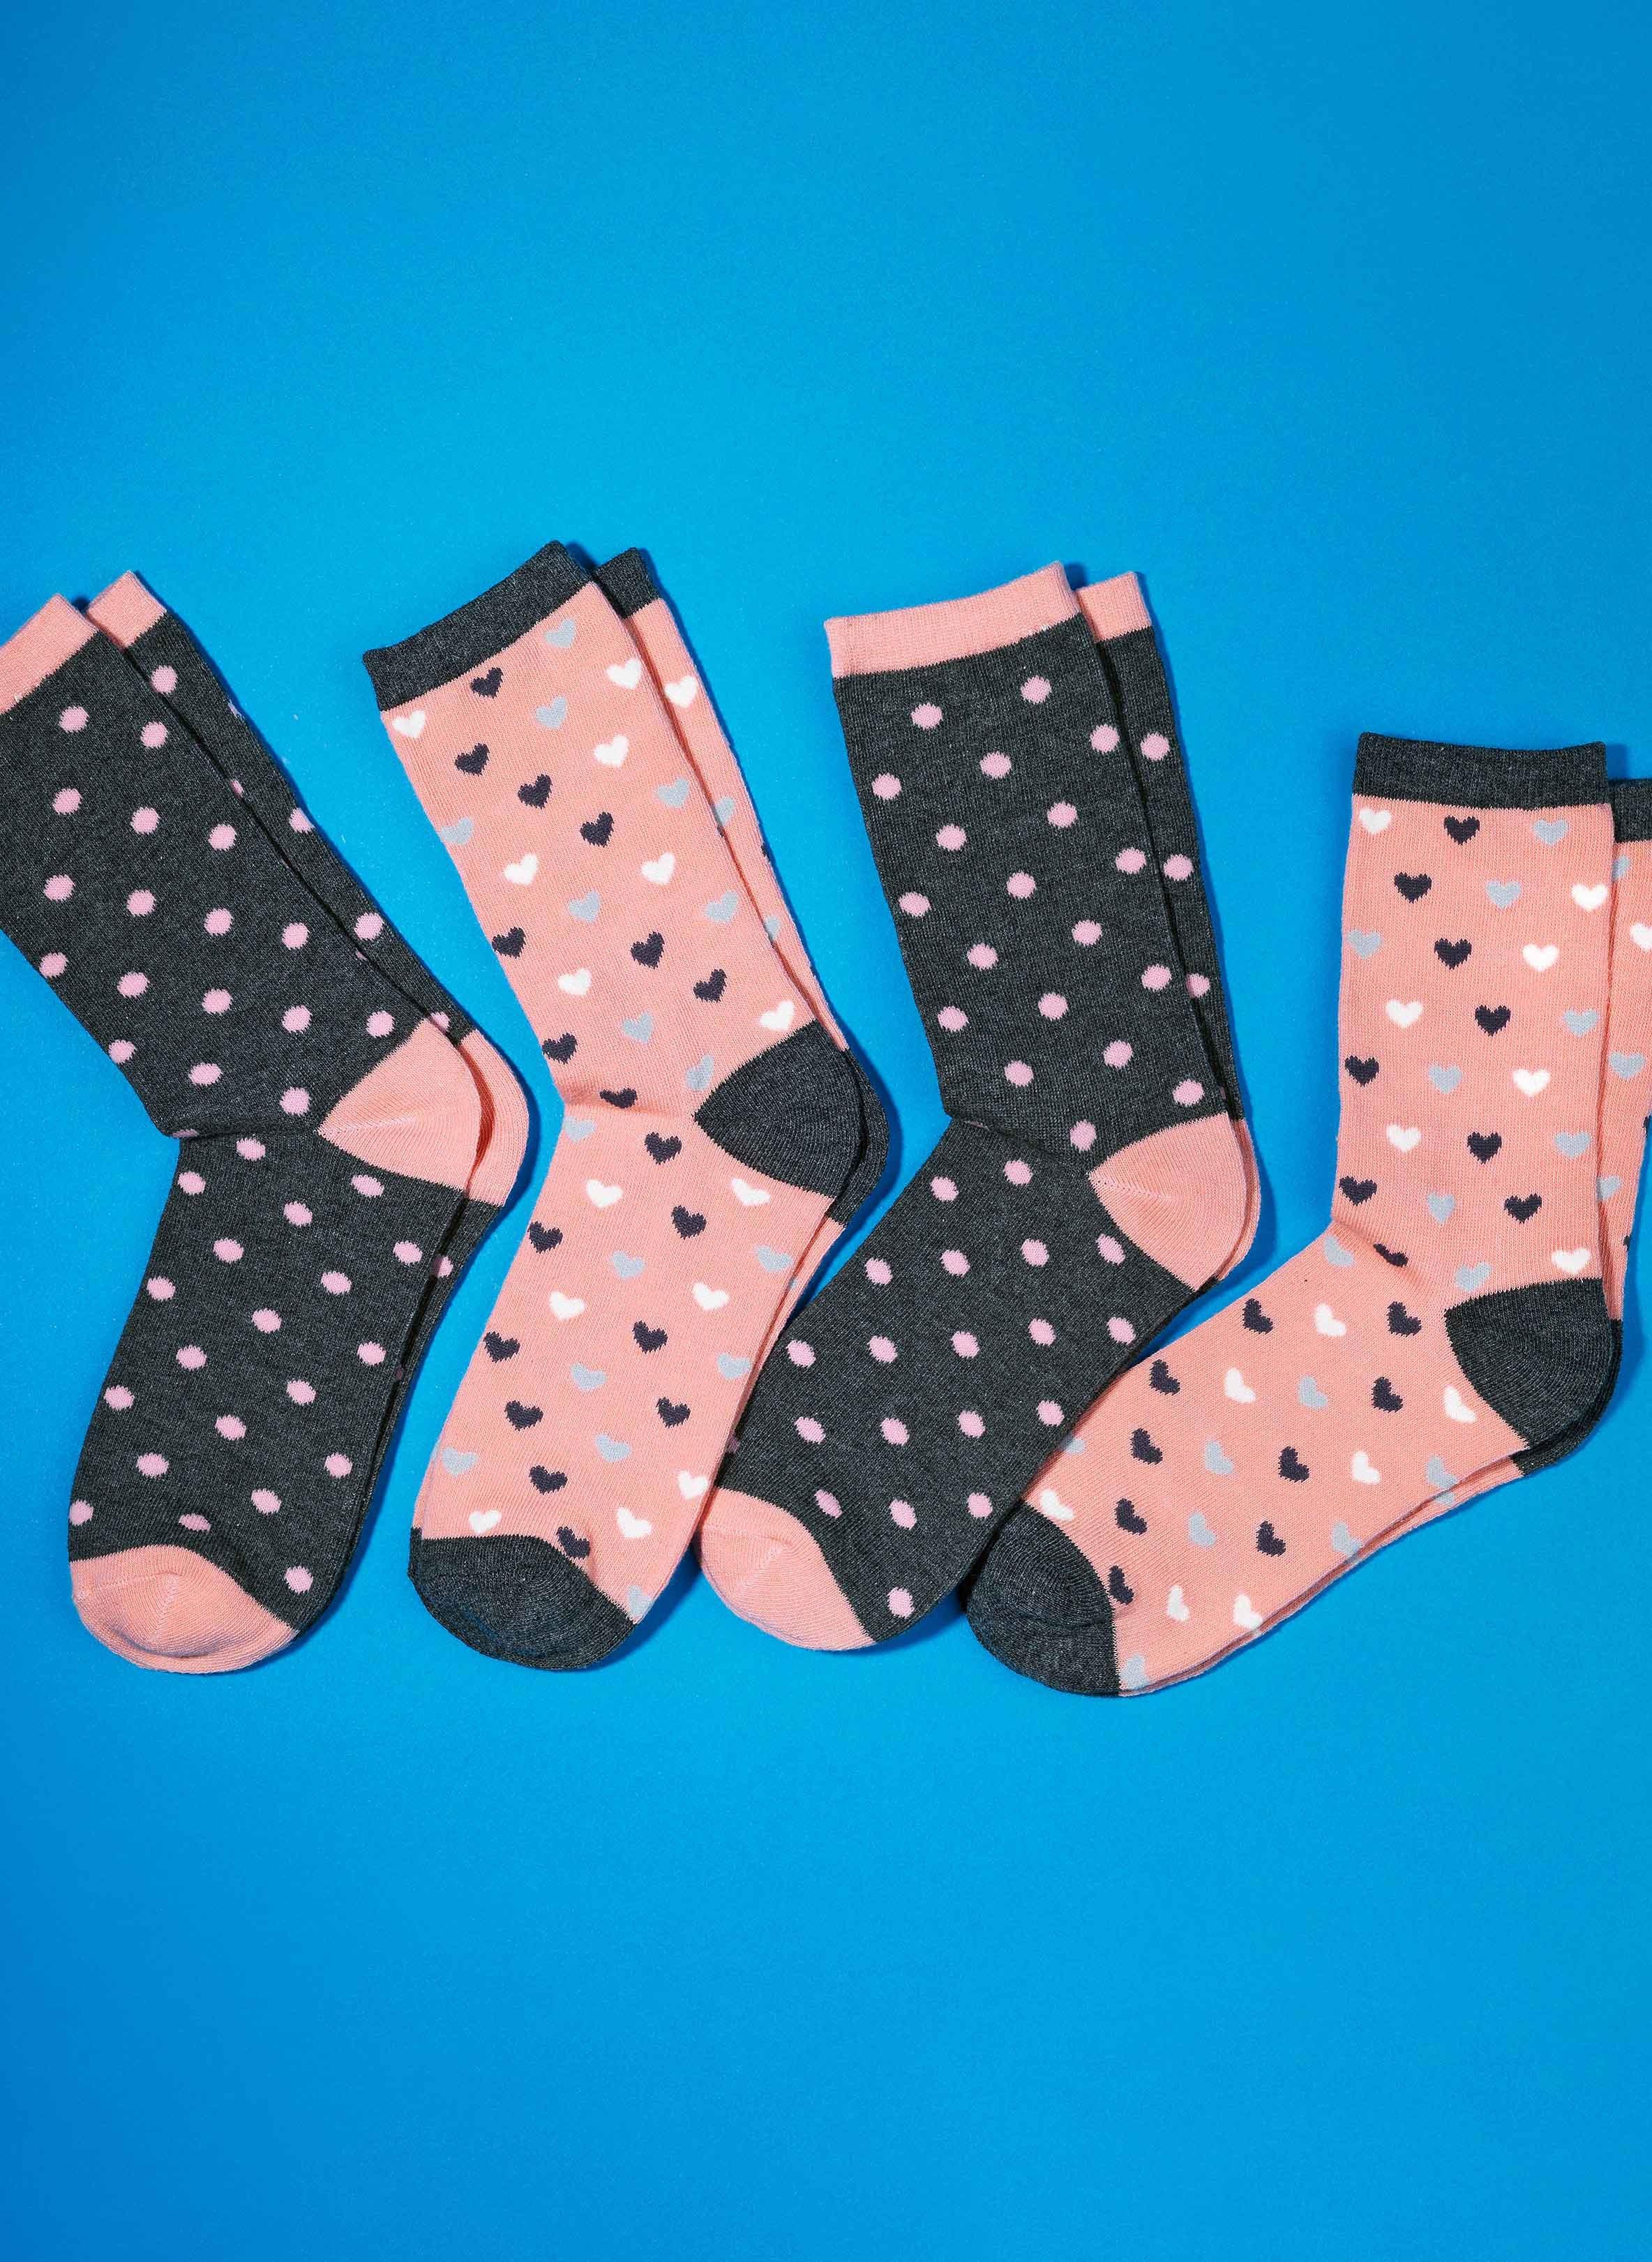 Damen-Socken, gewobene Herzli/Tupfen, 4 Paar